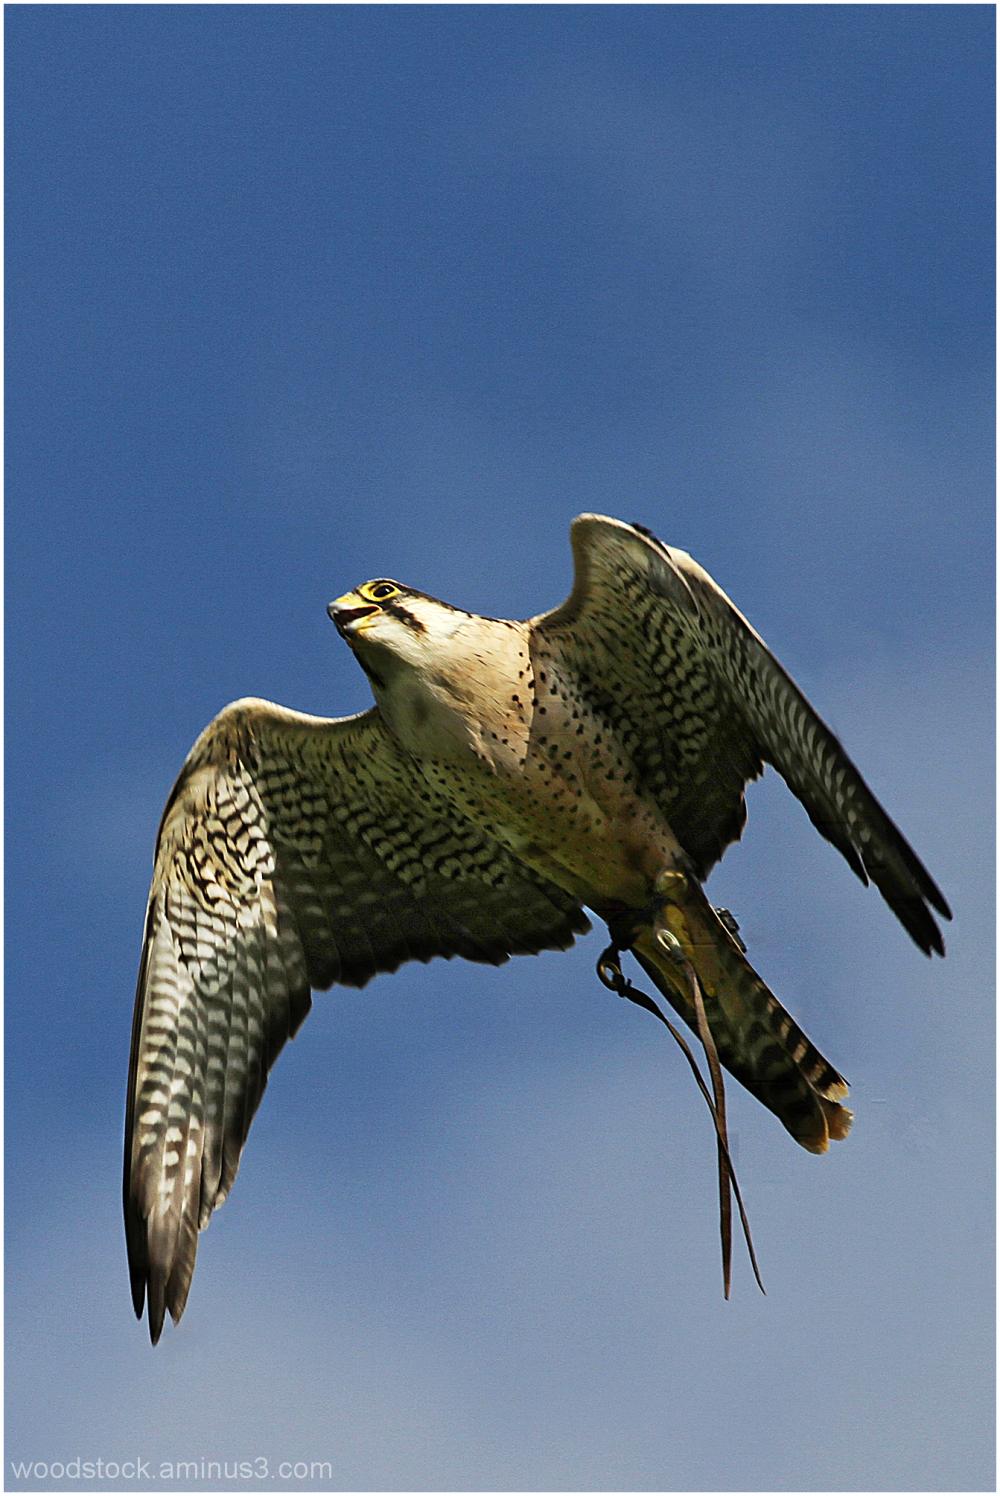 Newent Bird of Prey Centre